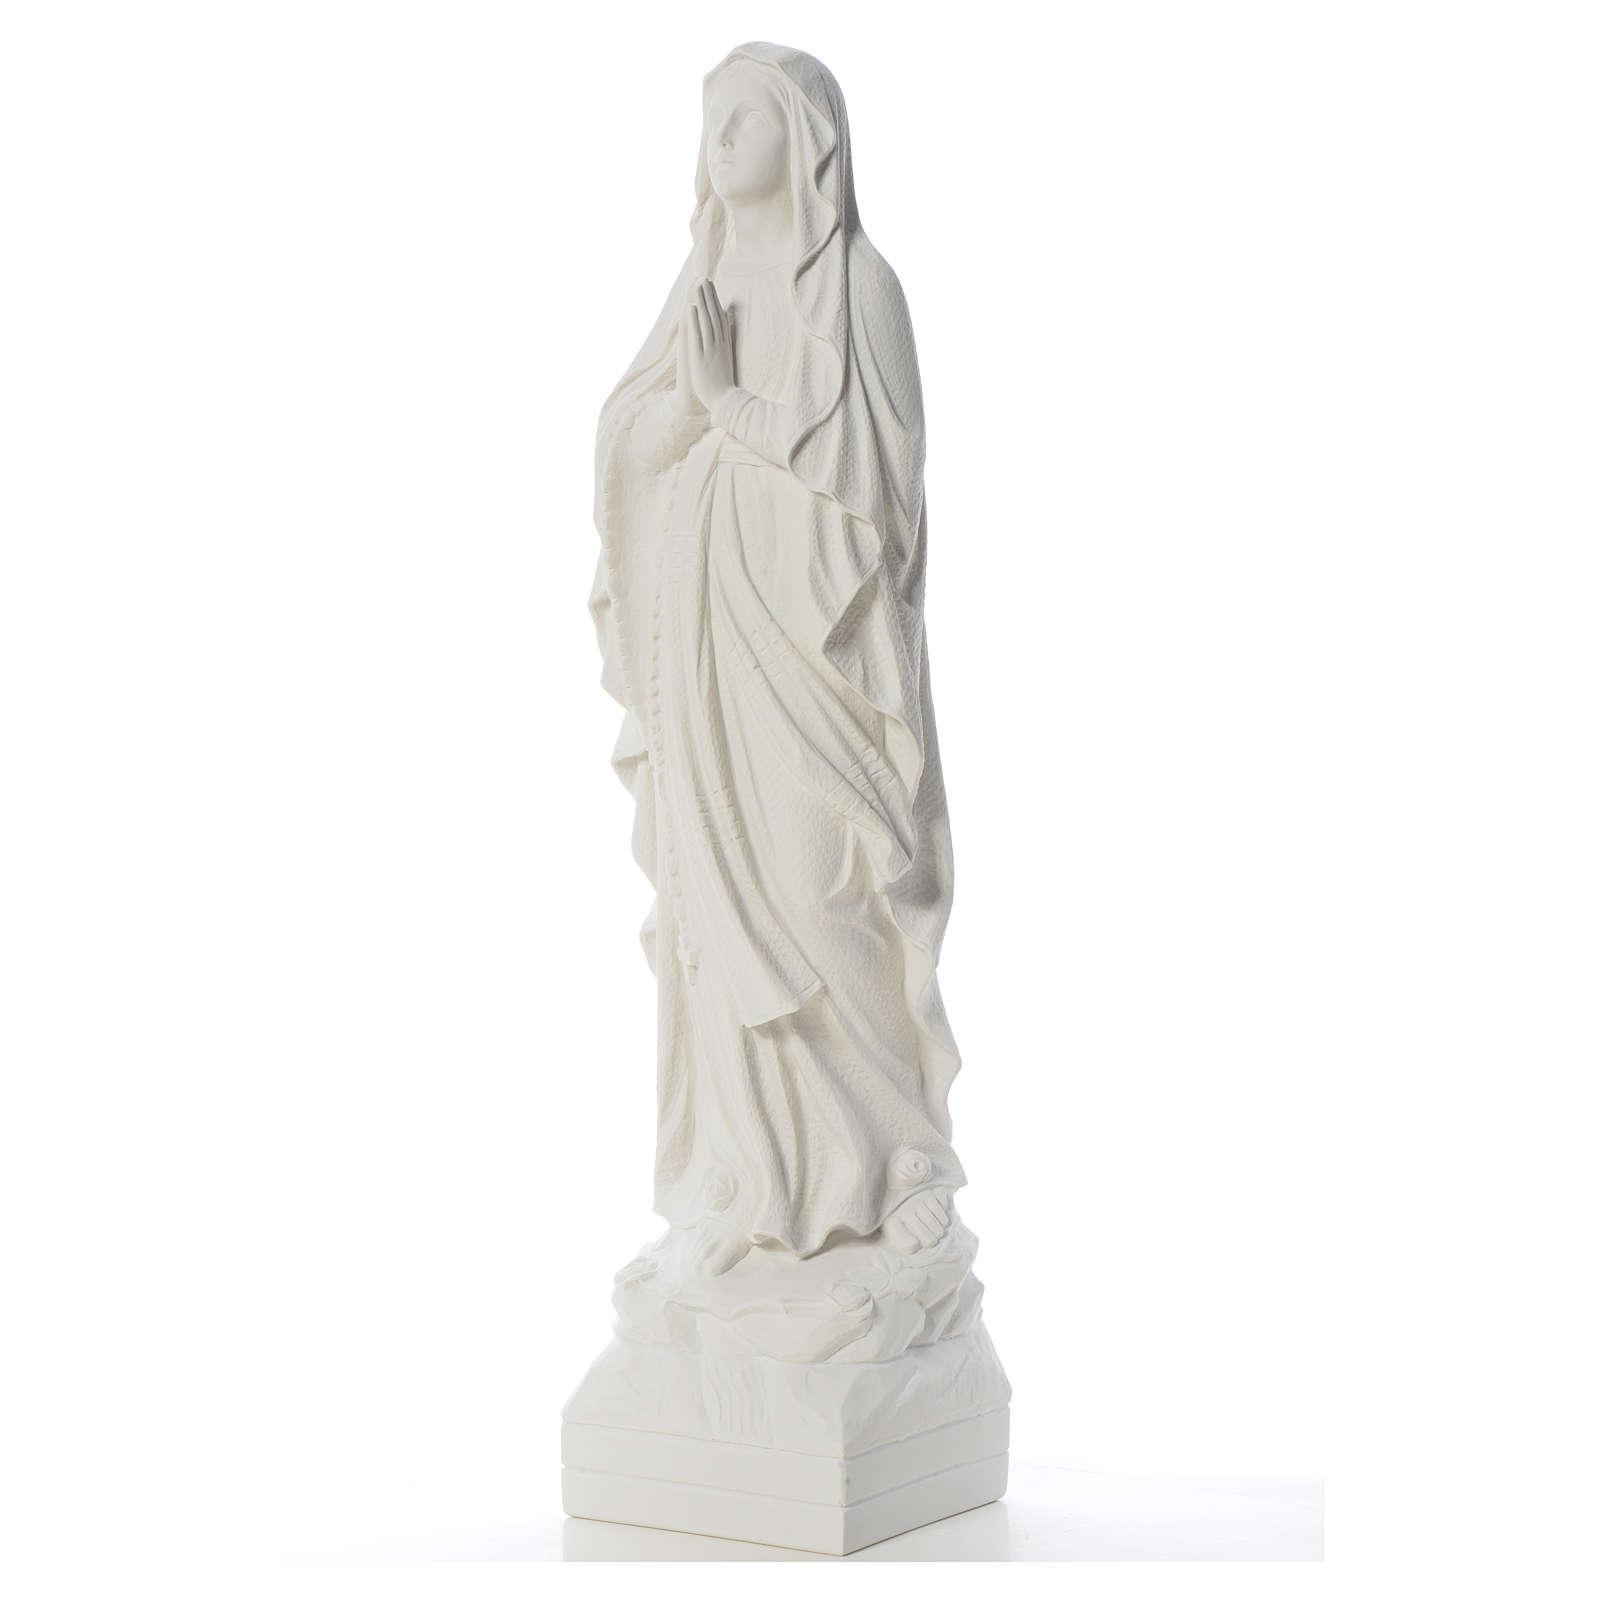 Virgen de Lourdes 70cm polvo de mármol blanco 4